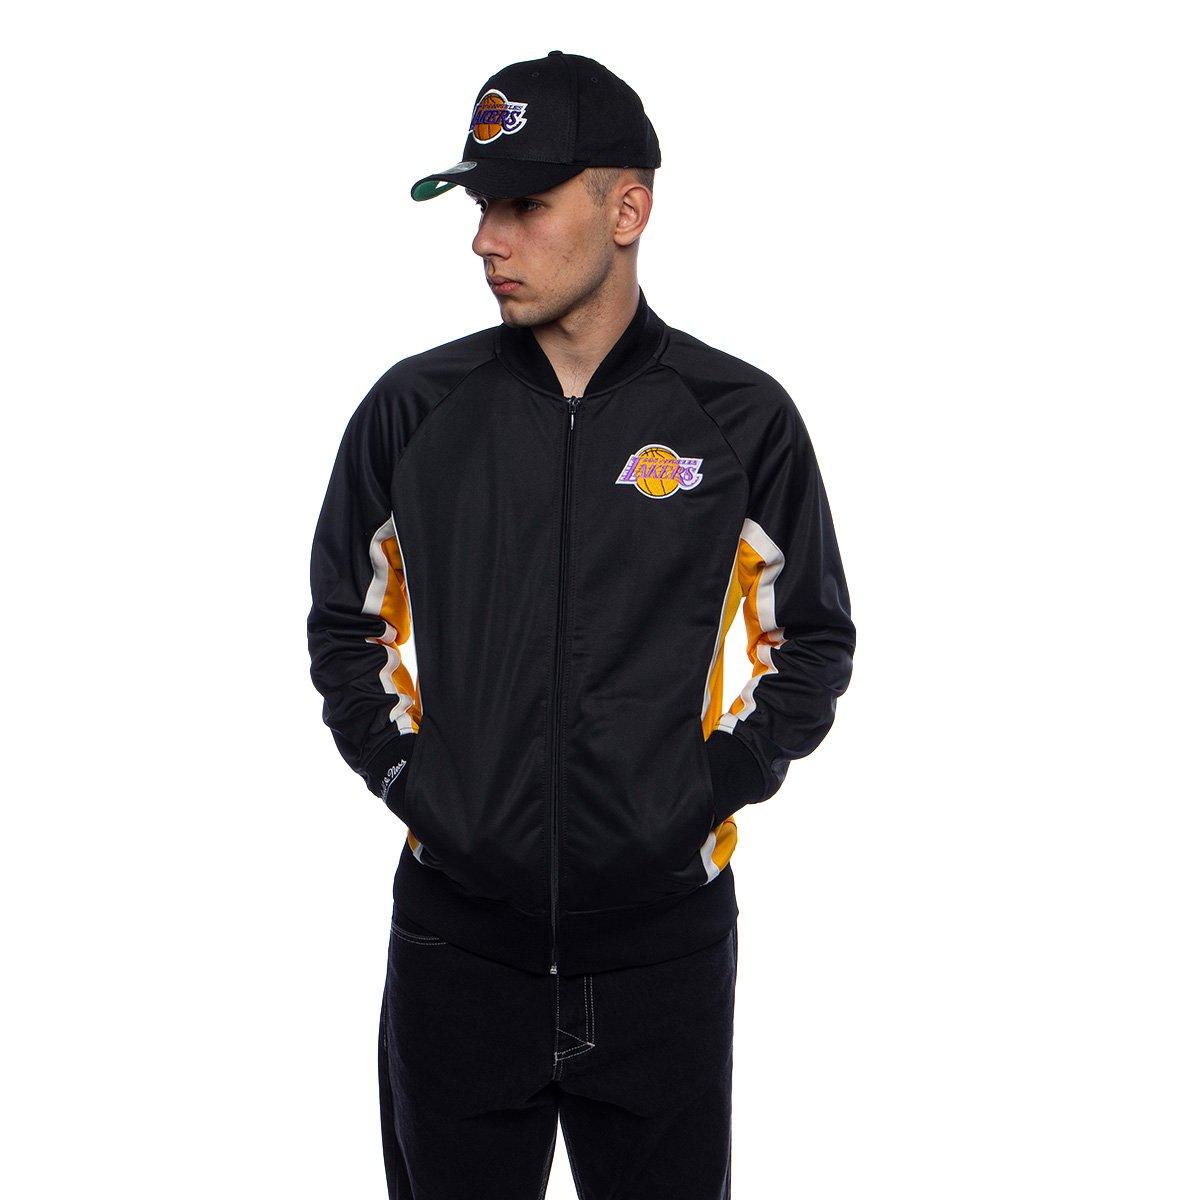 Mitchell Ness Jacket Los Angeles Lakers Black Championship Game Track Jacket Bludshop Com